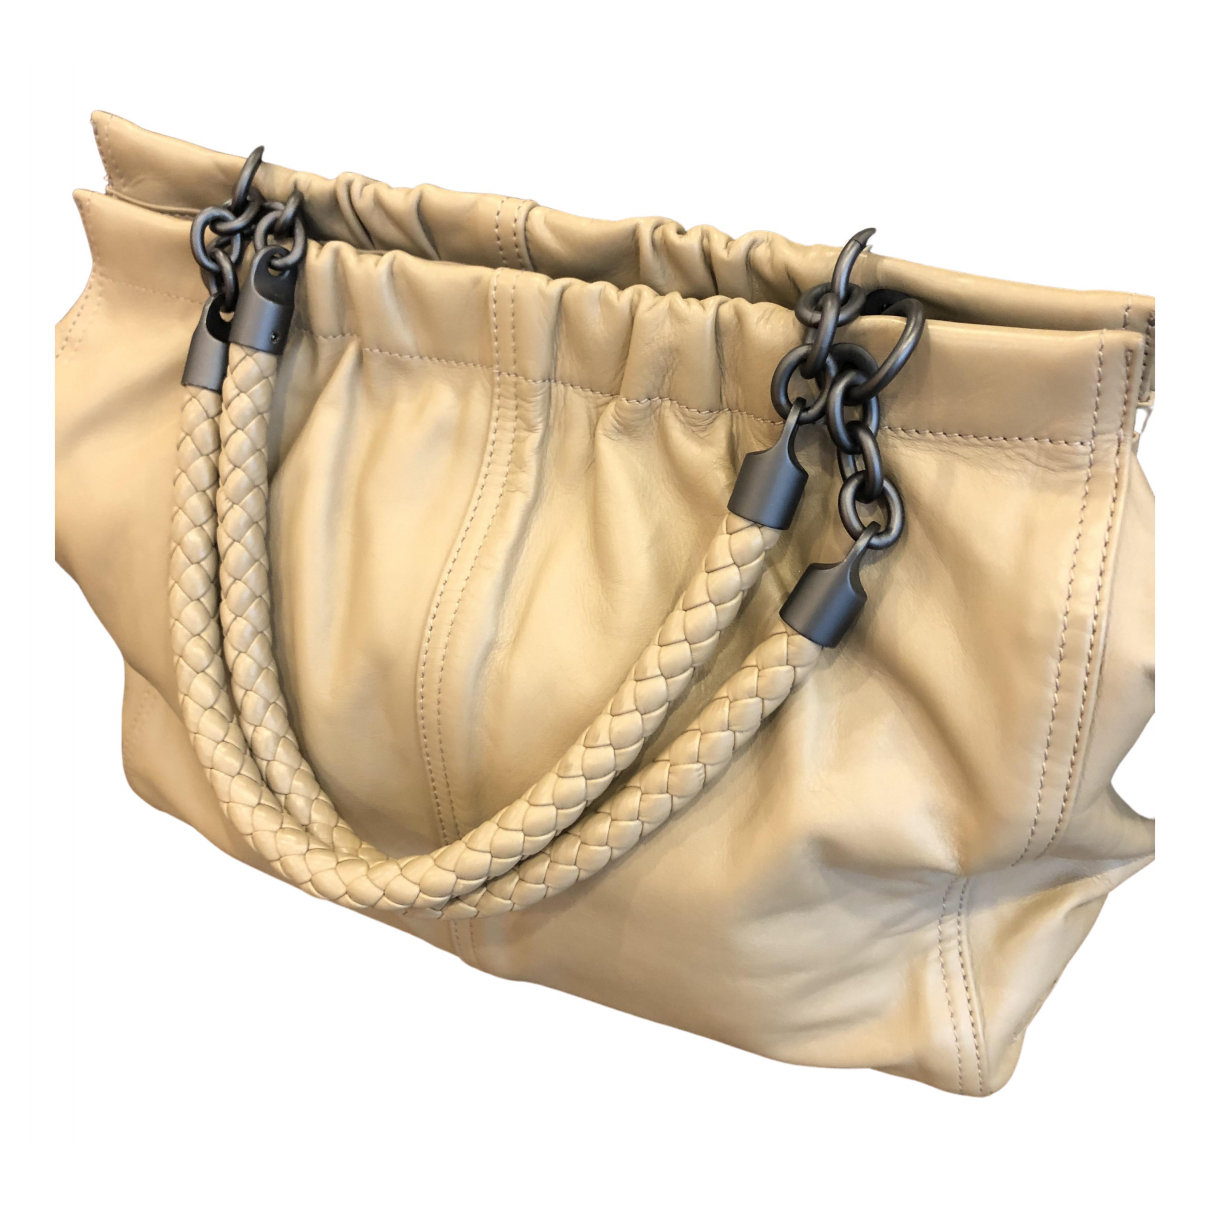 Bottega Veneta - Sac a main   pour femme en cuir - beige